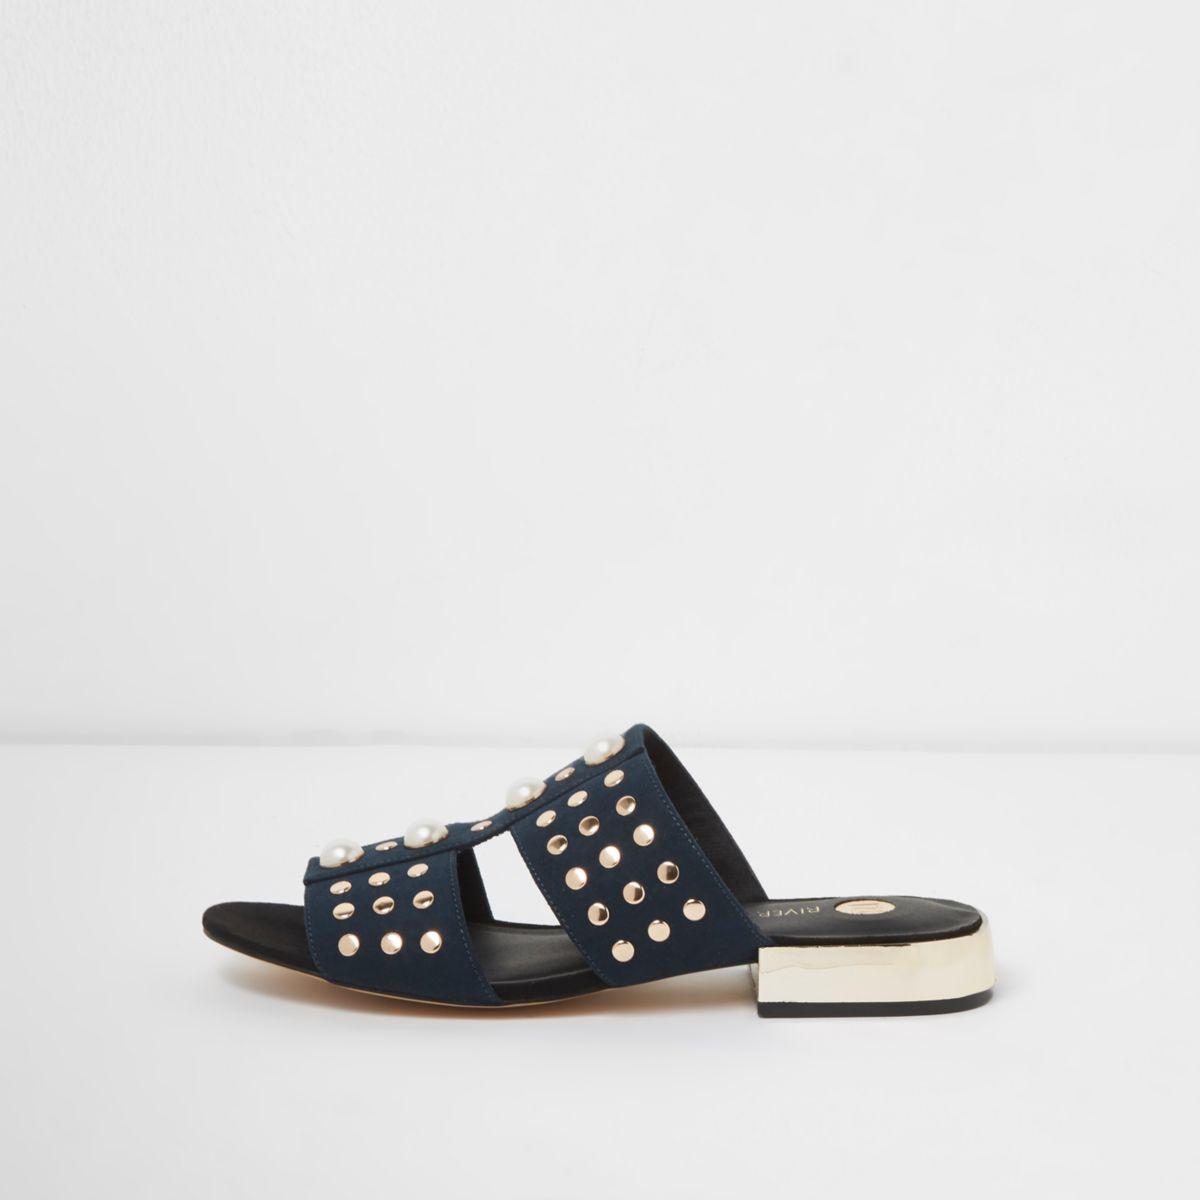 River Island Ladies Shoes Size